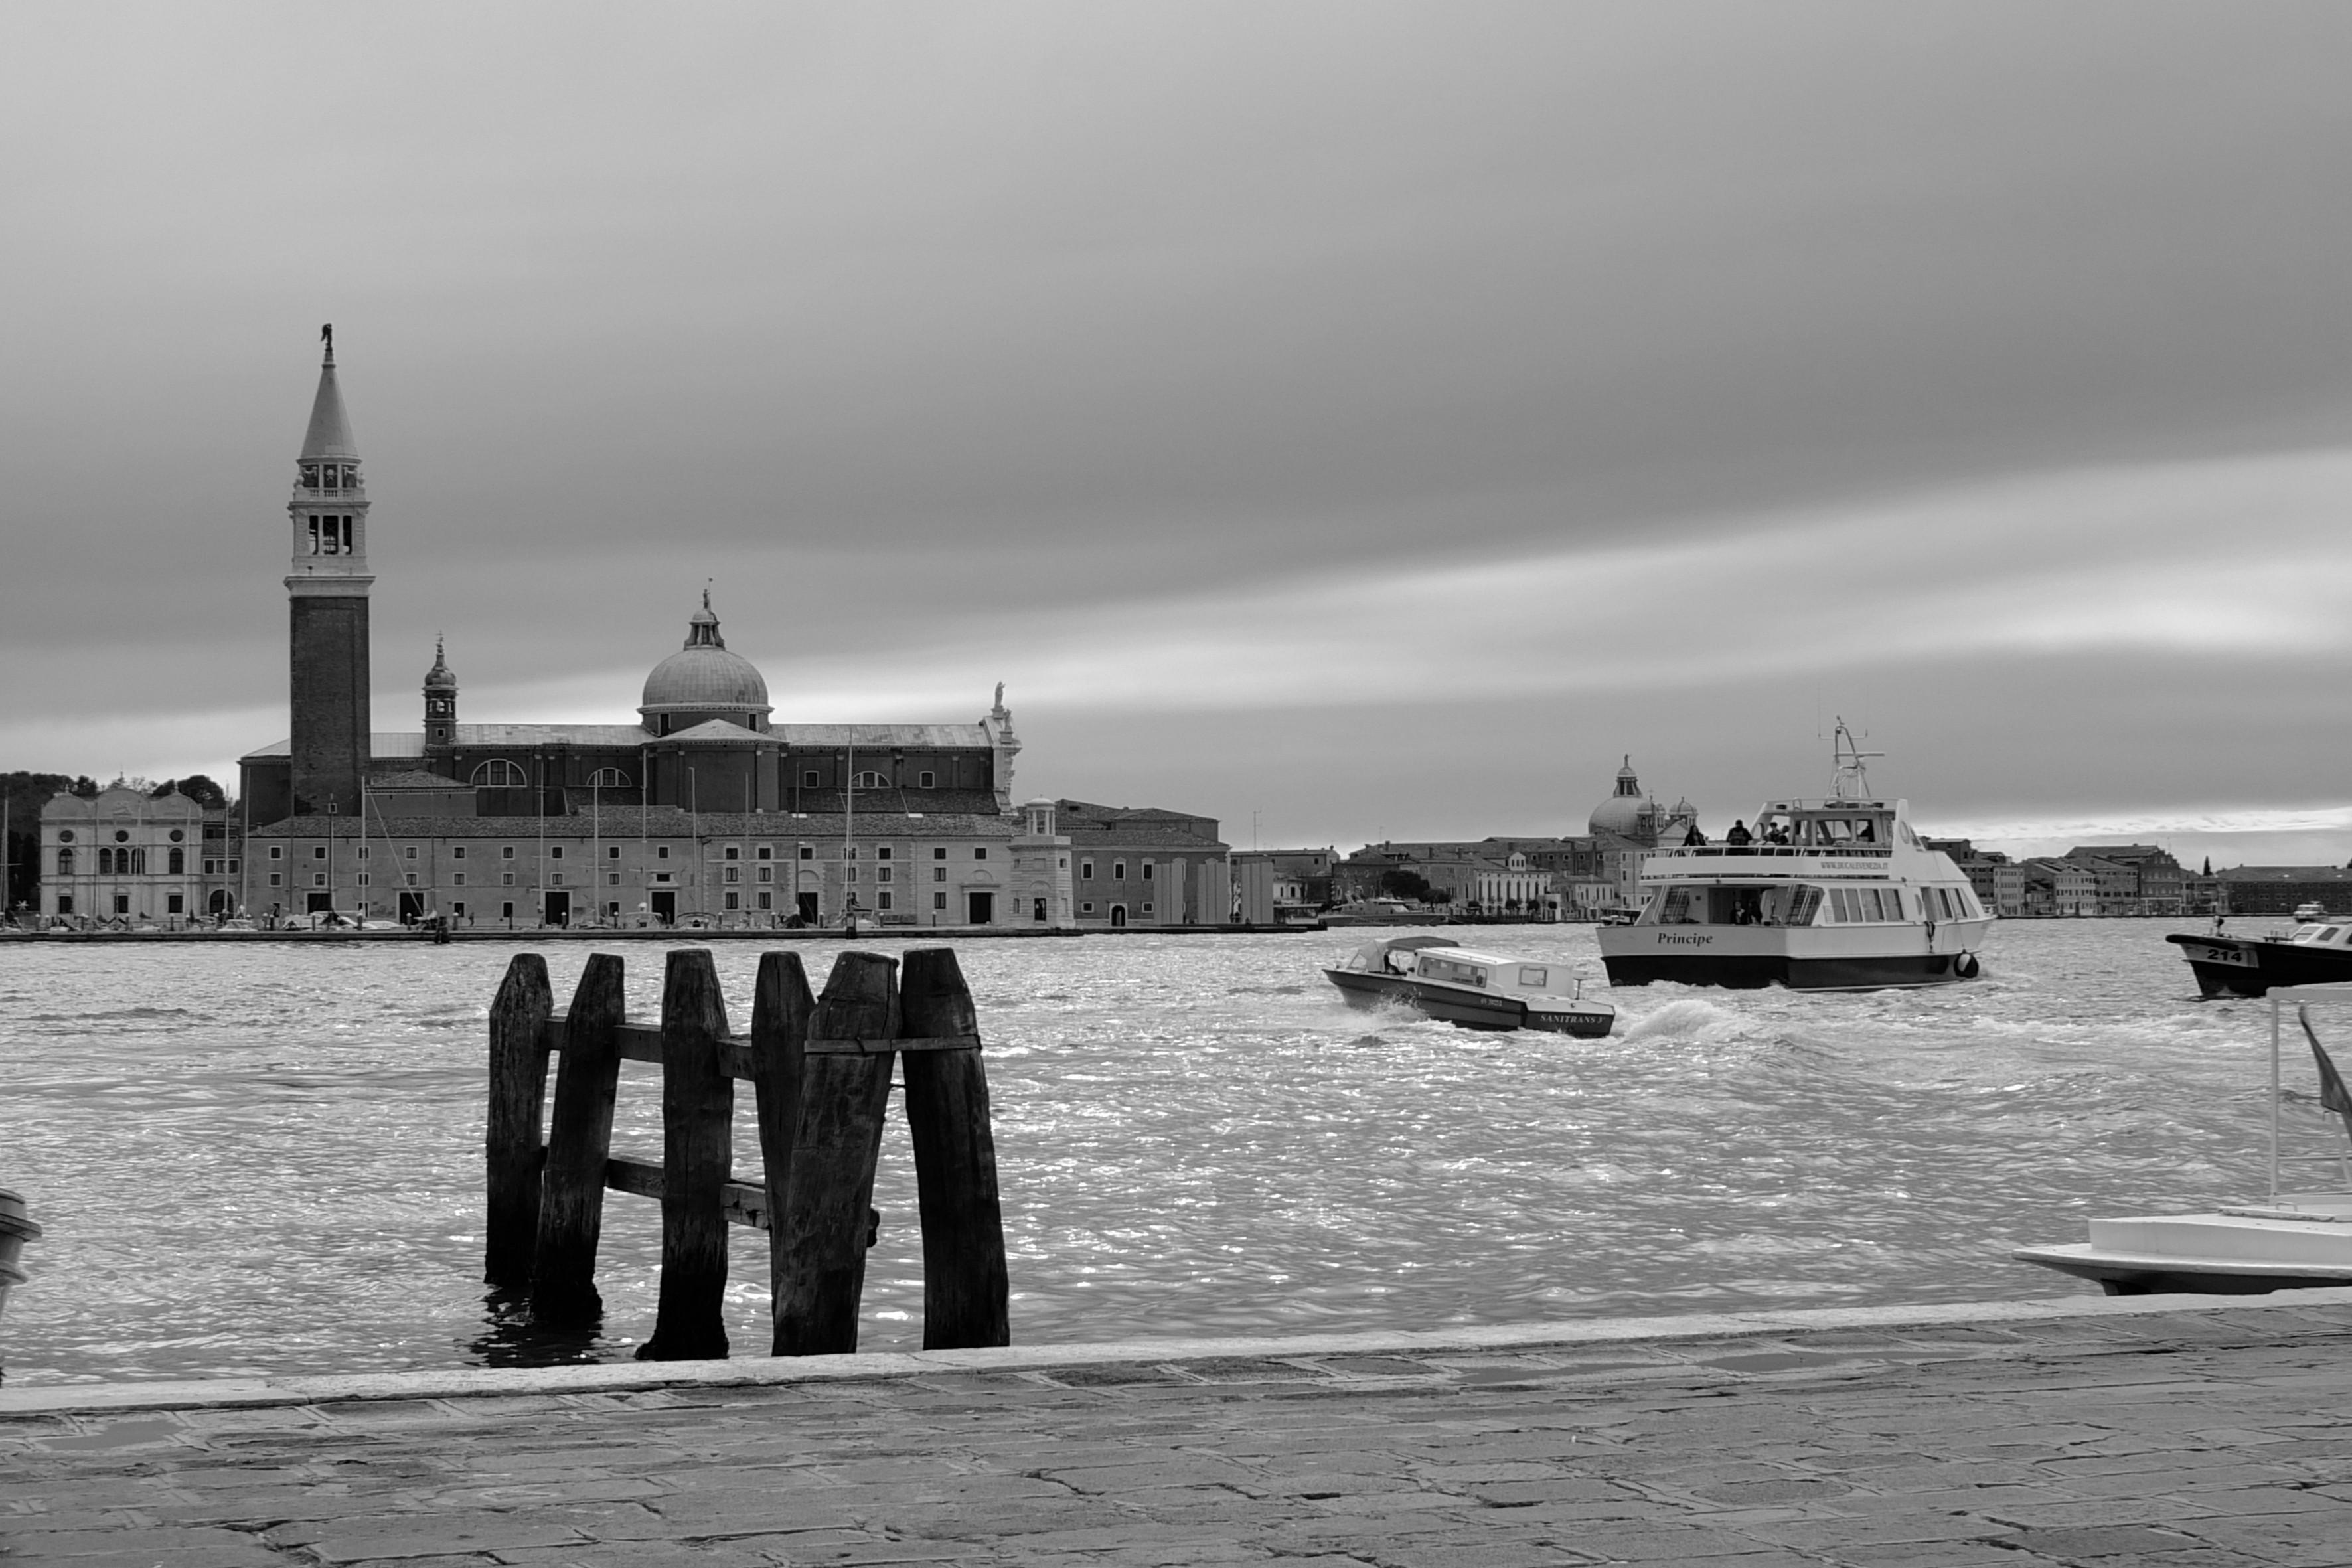 Detlef Paech, Venedig